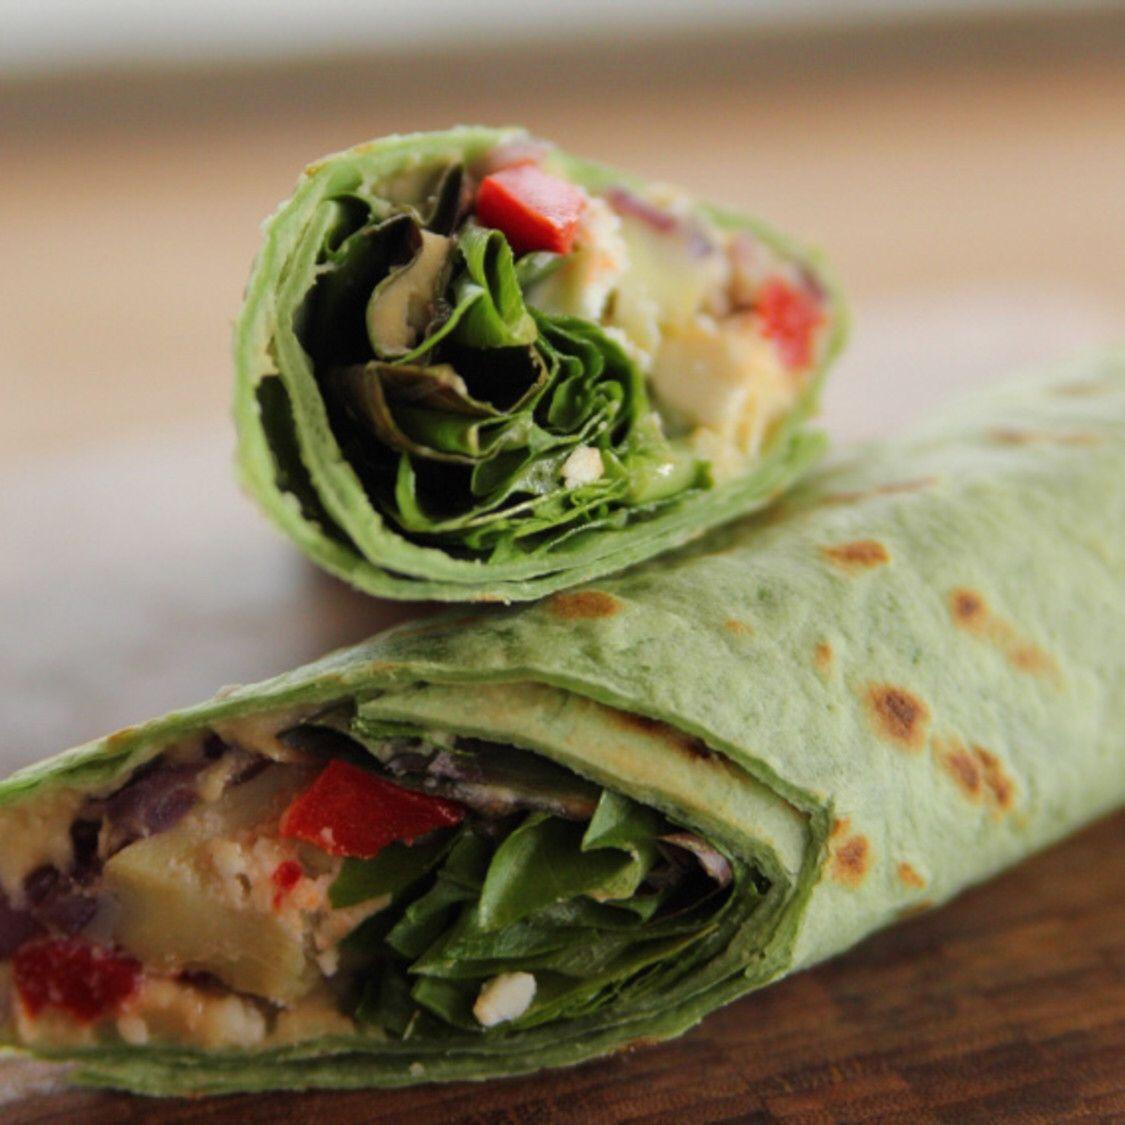 Heavenly hummus wrap with homemade hummus recipe in 2020